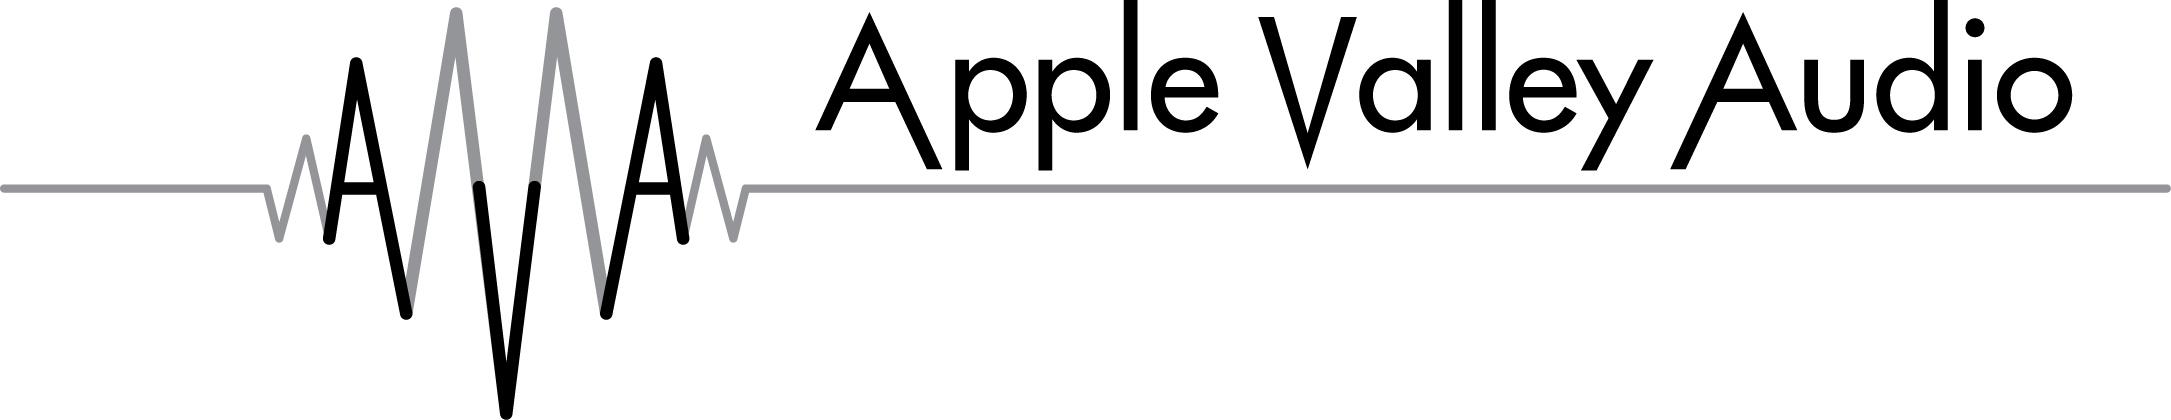 Apple Valley Audio